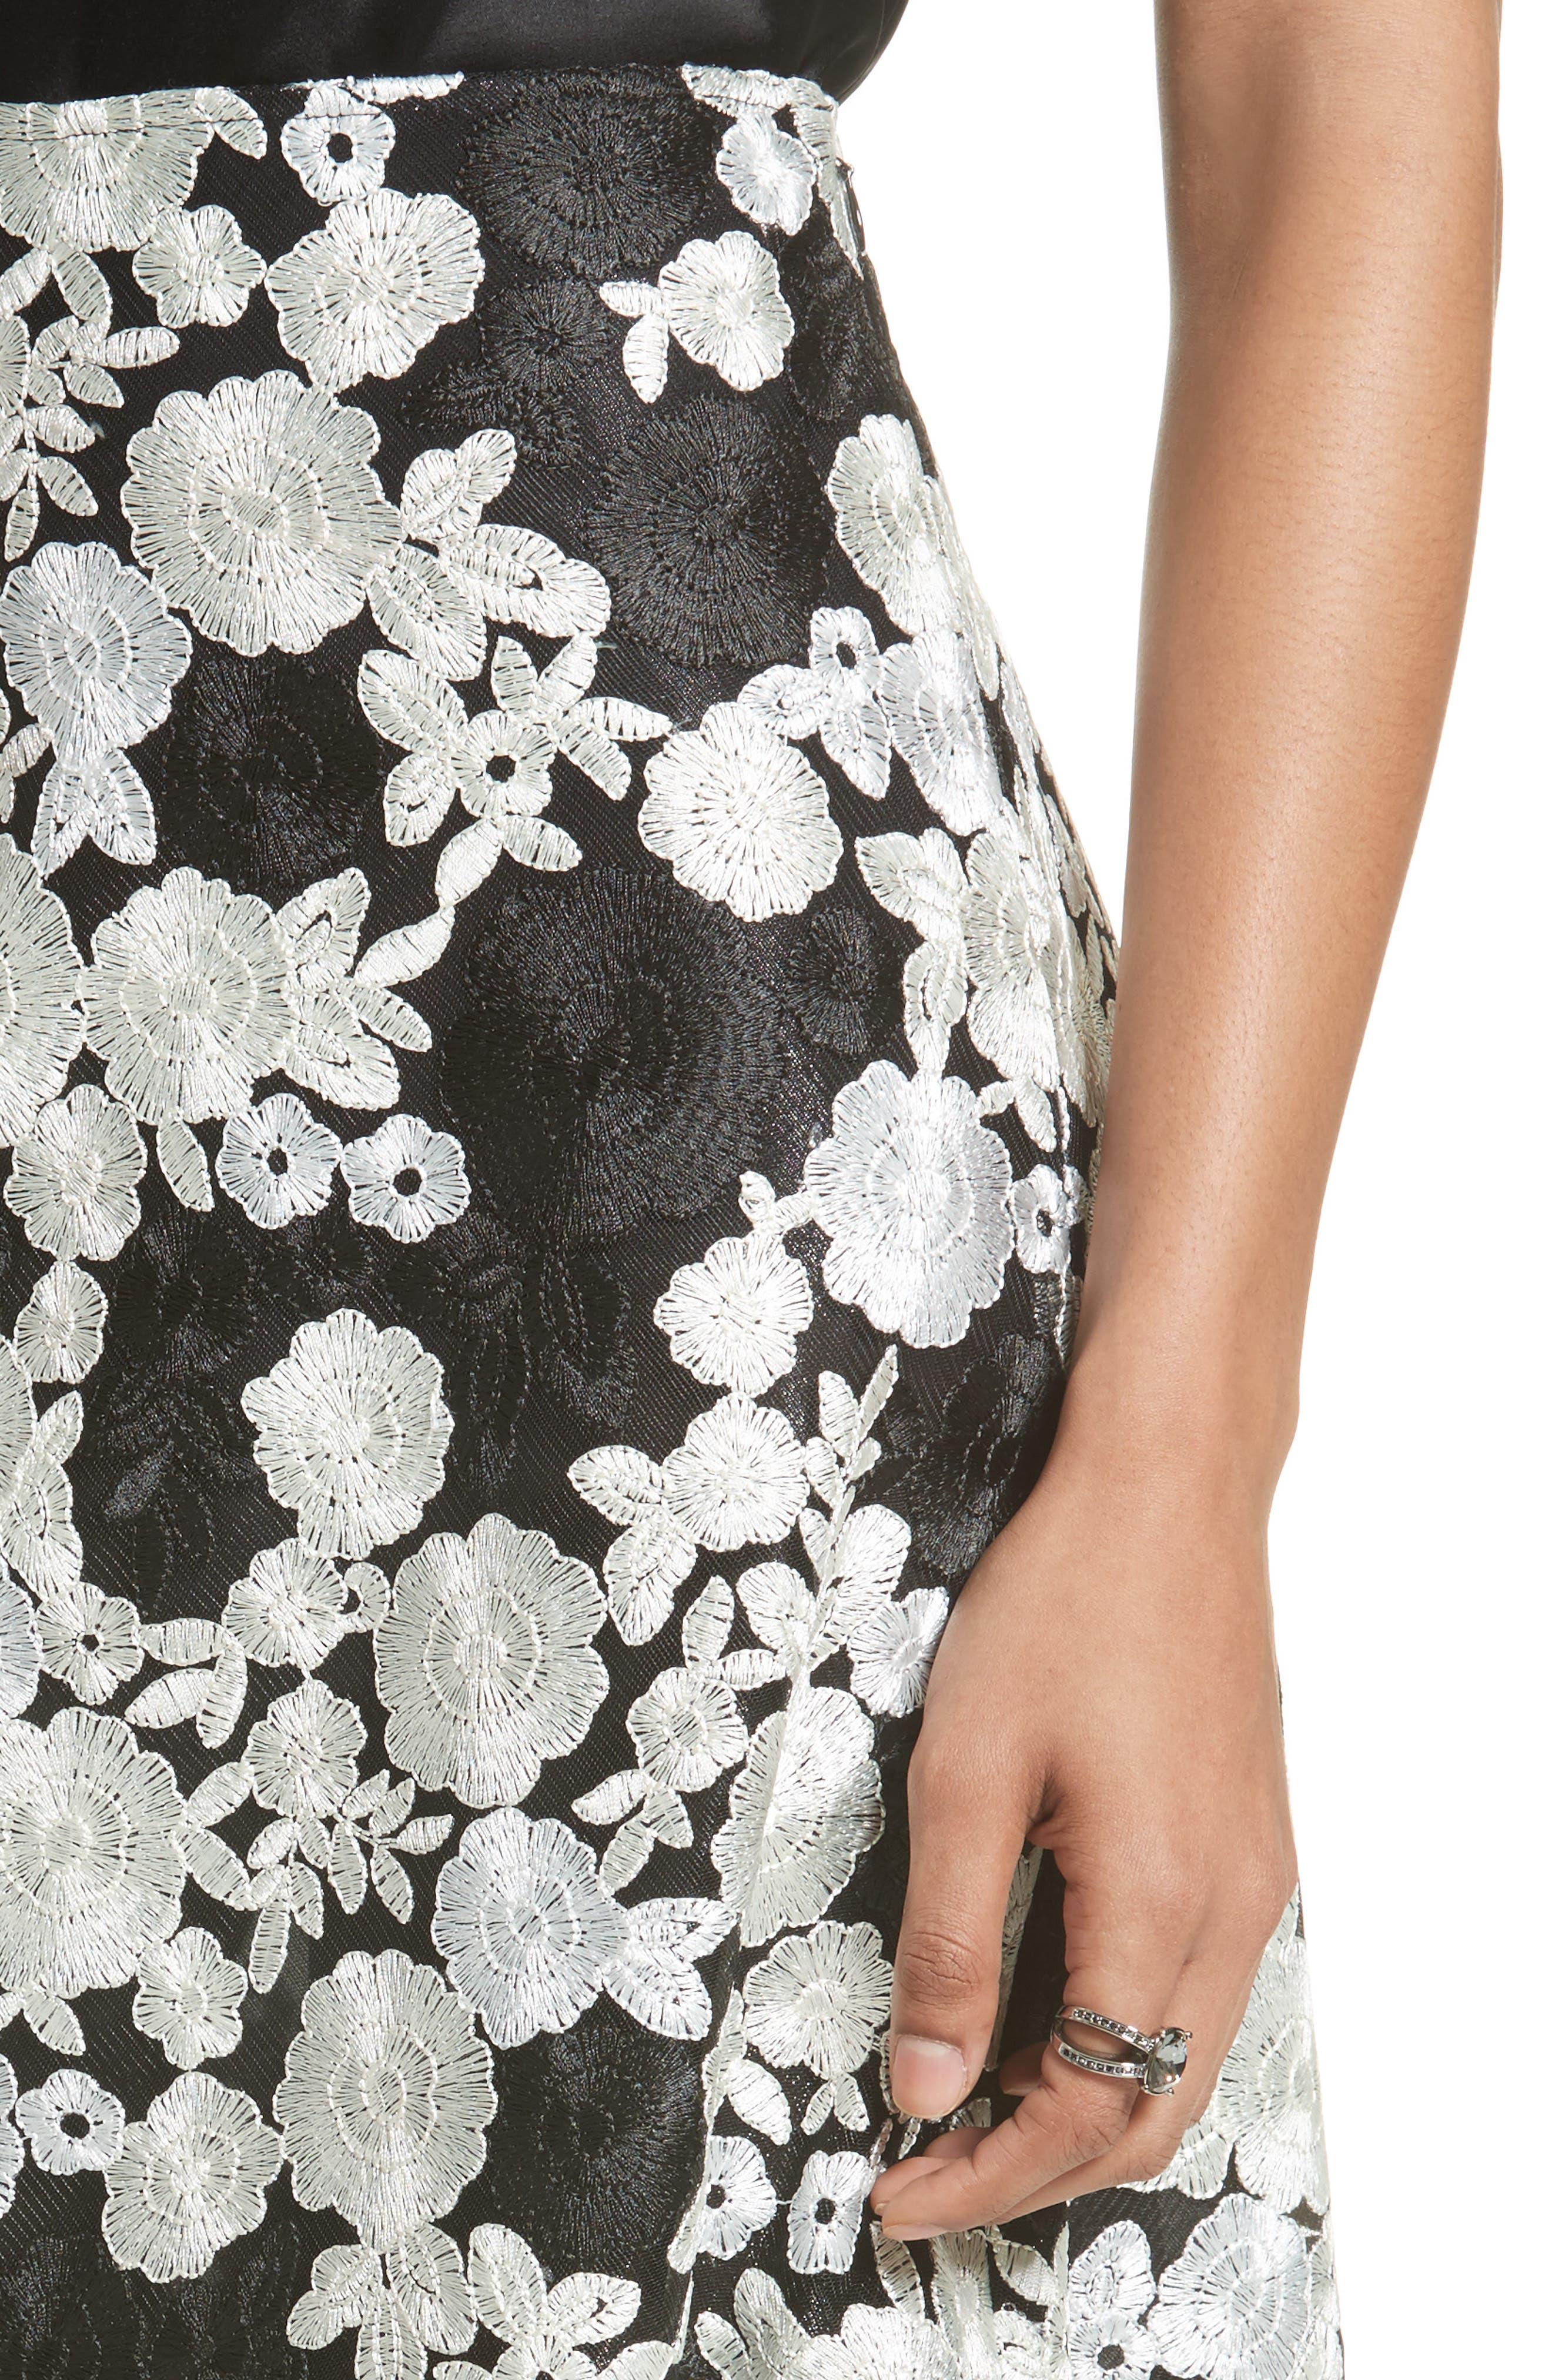 St. John Floral Embroidered Flared Skirt,                             Alternate thumbnail 4, color,                             Caviar Multi